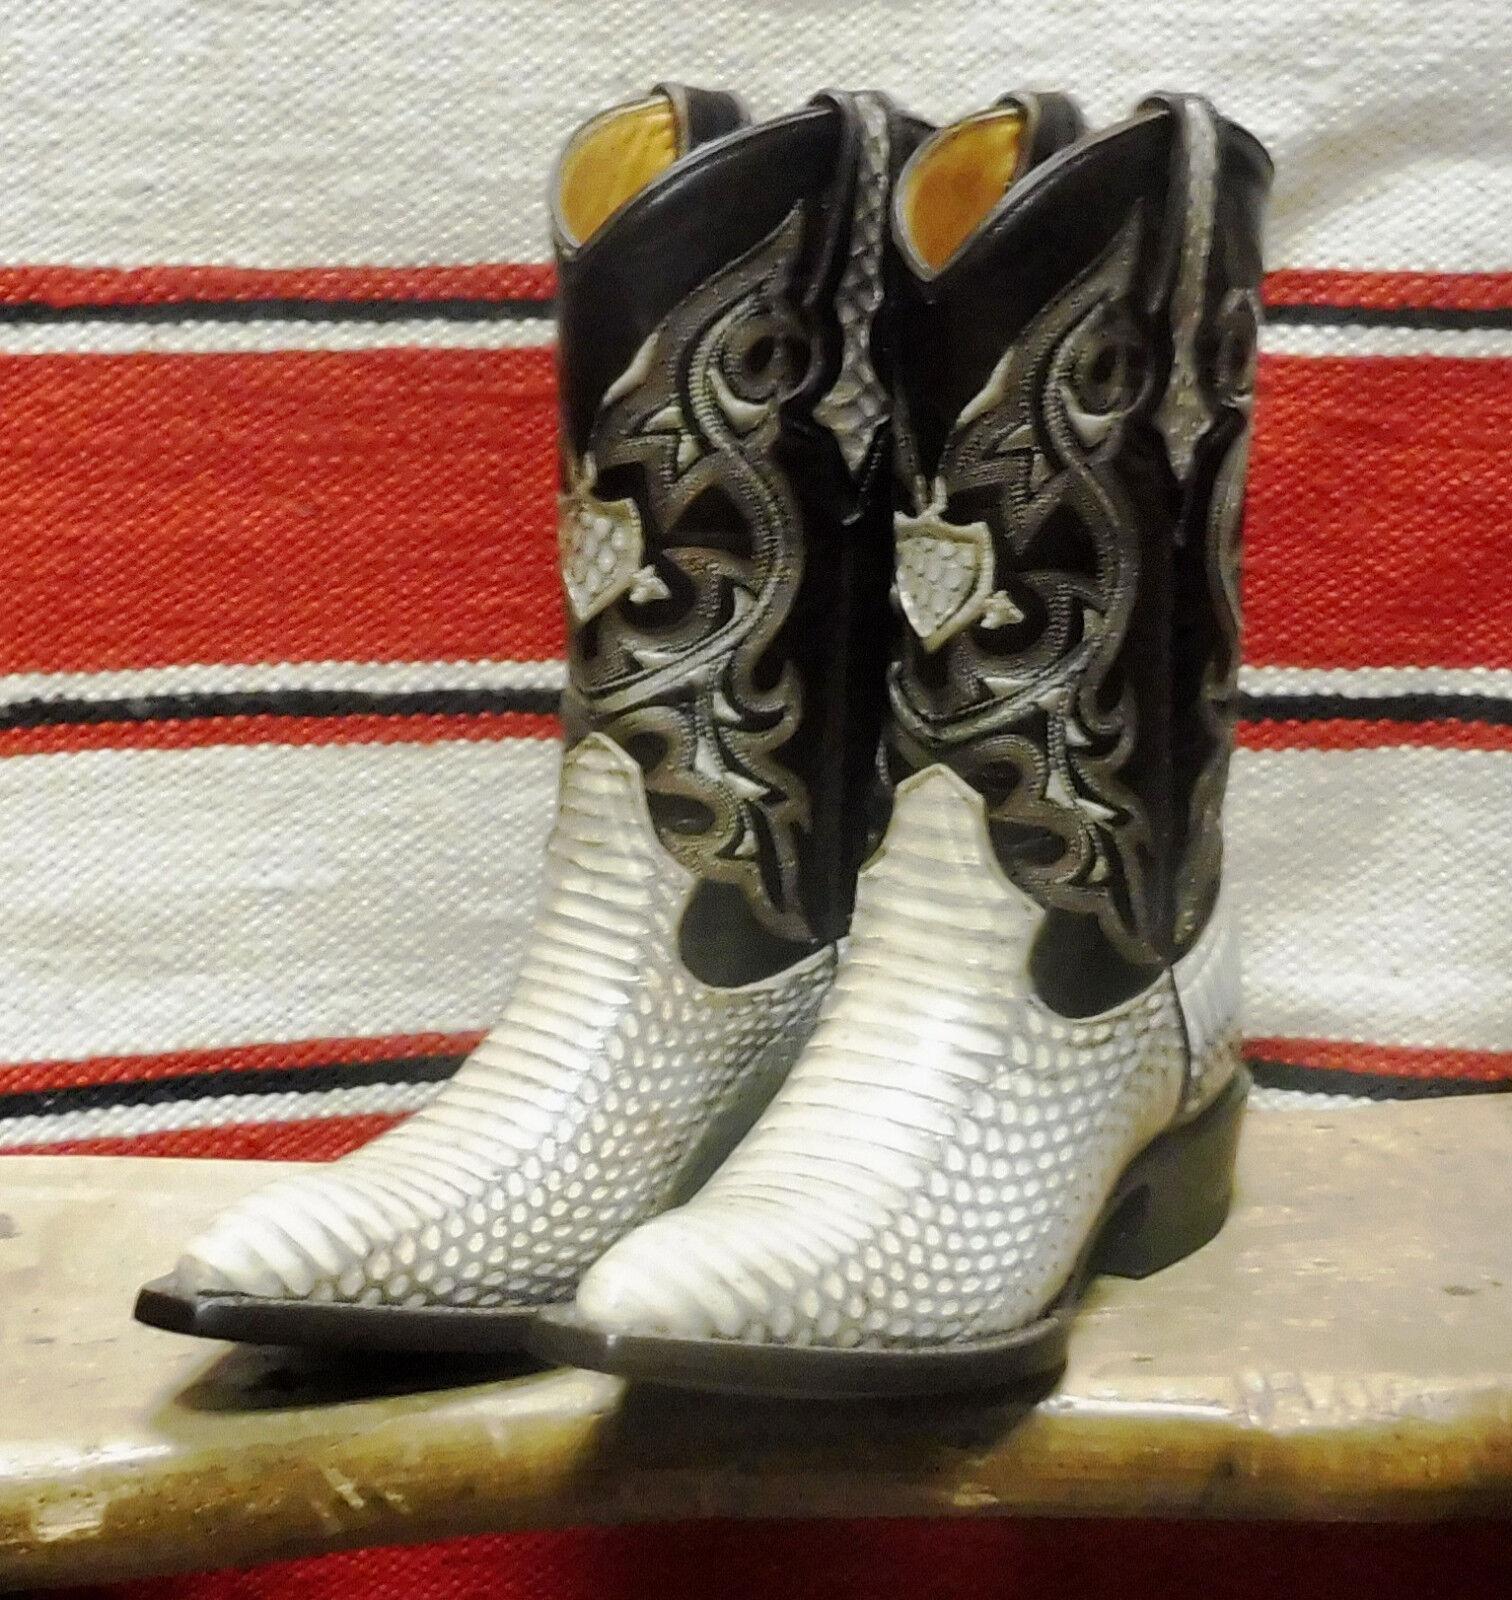 ... Stivali stivale texani country western cowboy donna esotico pitone  pitone pitone serpente 35 8efff8 6a200699512